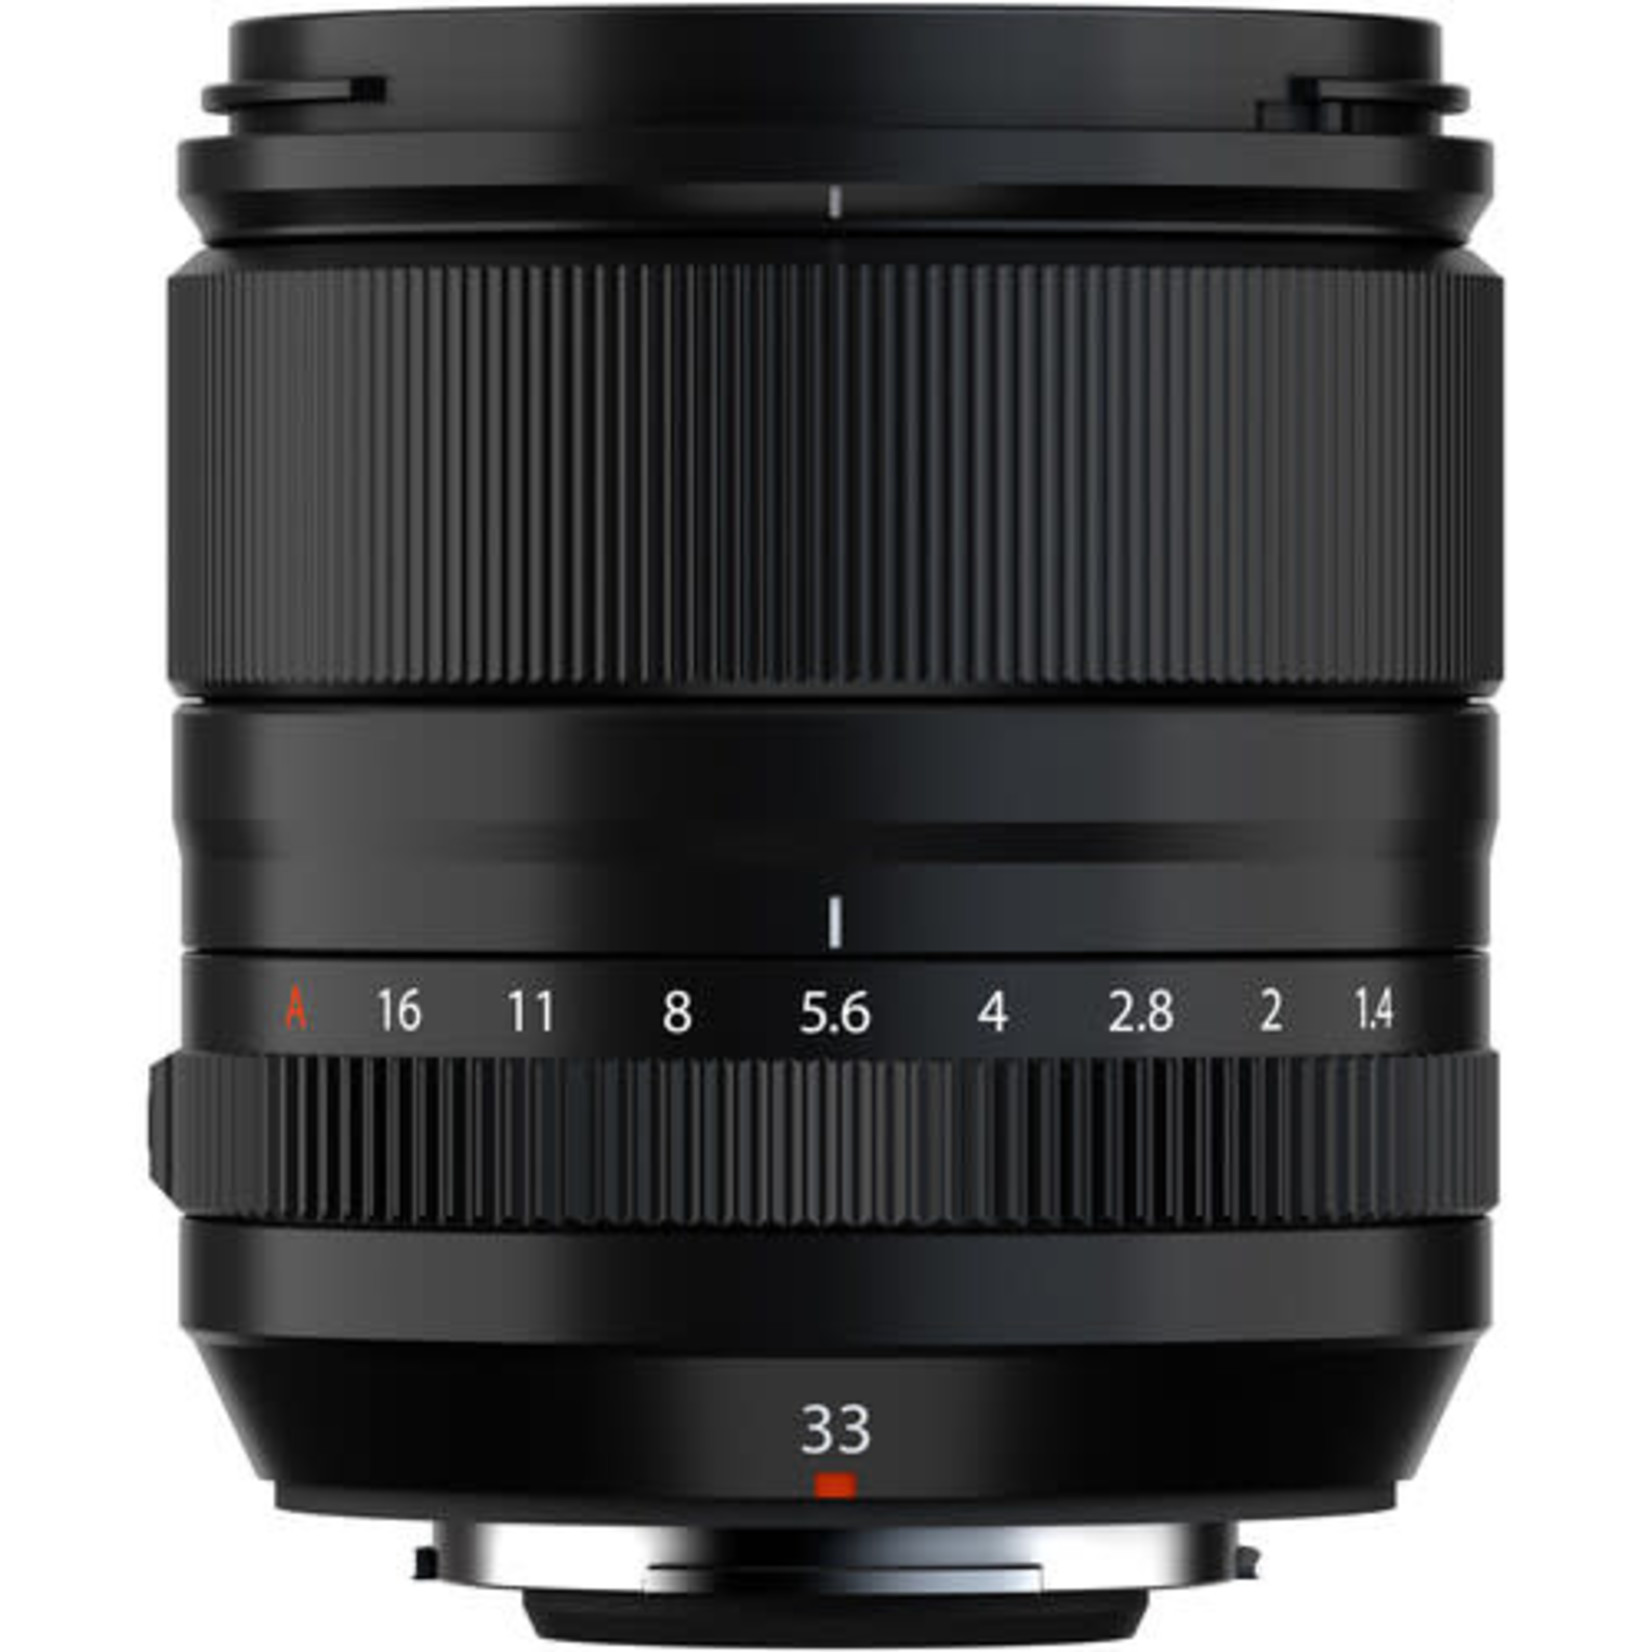 FujiFilm FUJIFILM XF 33mm f/1.4 R LM WR Lens